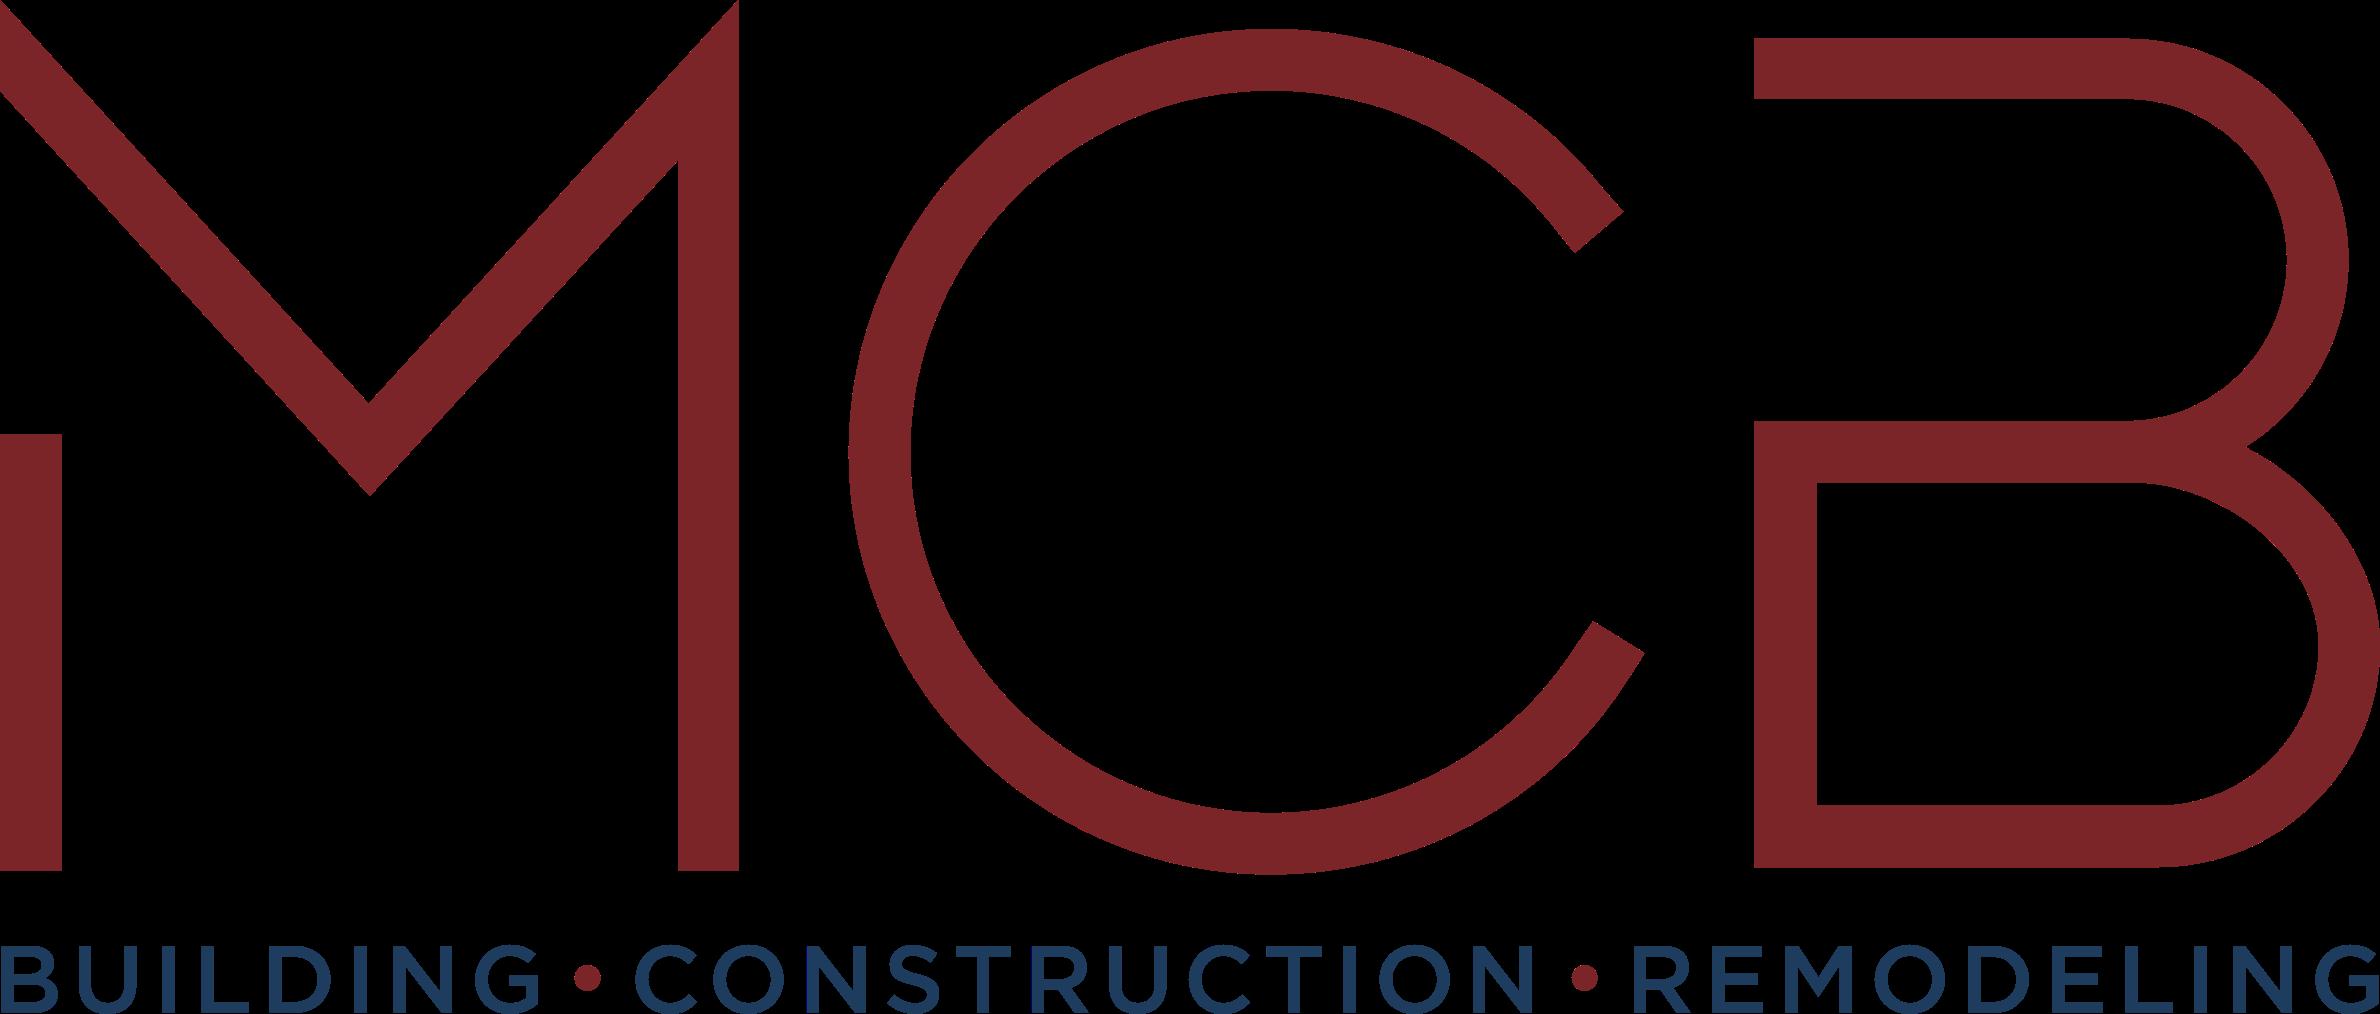 MCB_Logo_Recolor_1815C